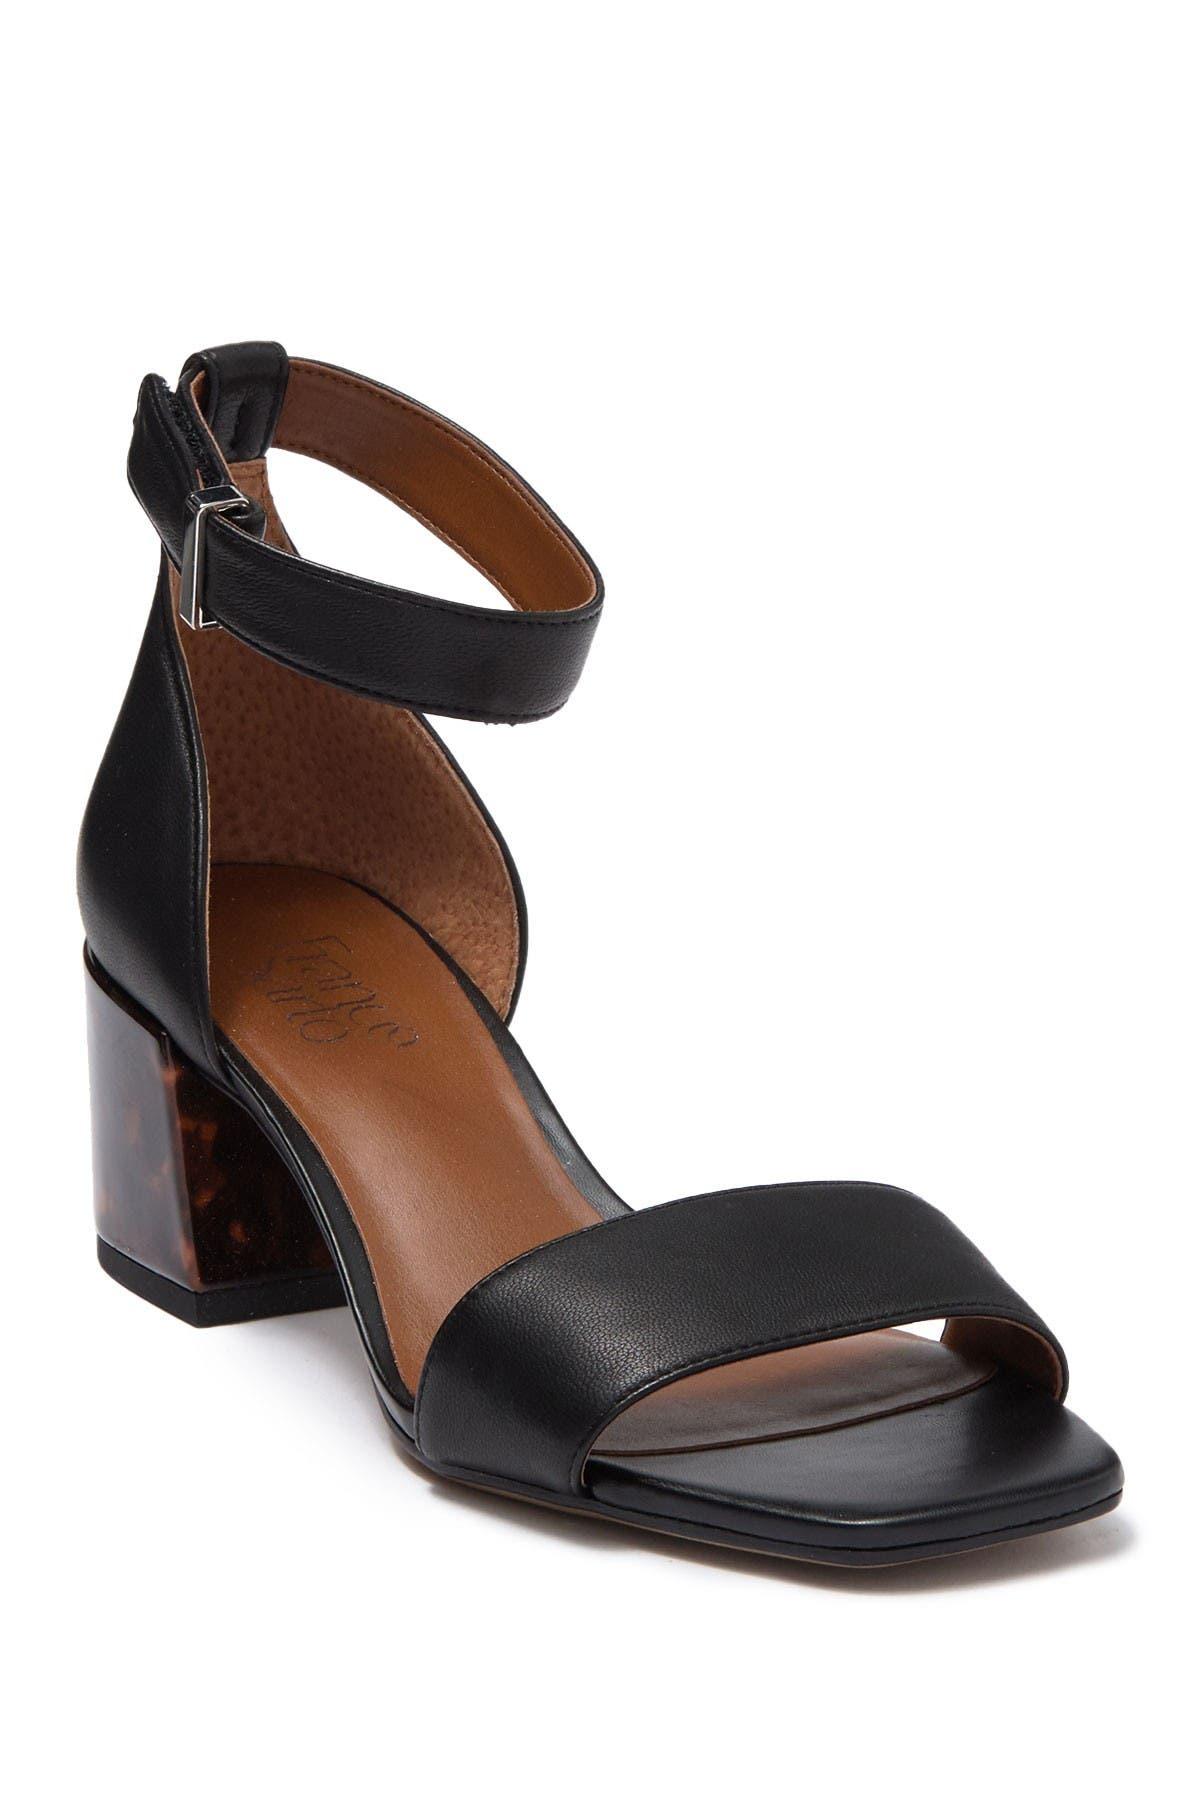 Image of Franco Sarto Merryl Ankle Strap Sandal